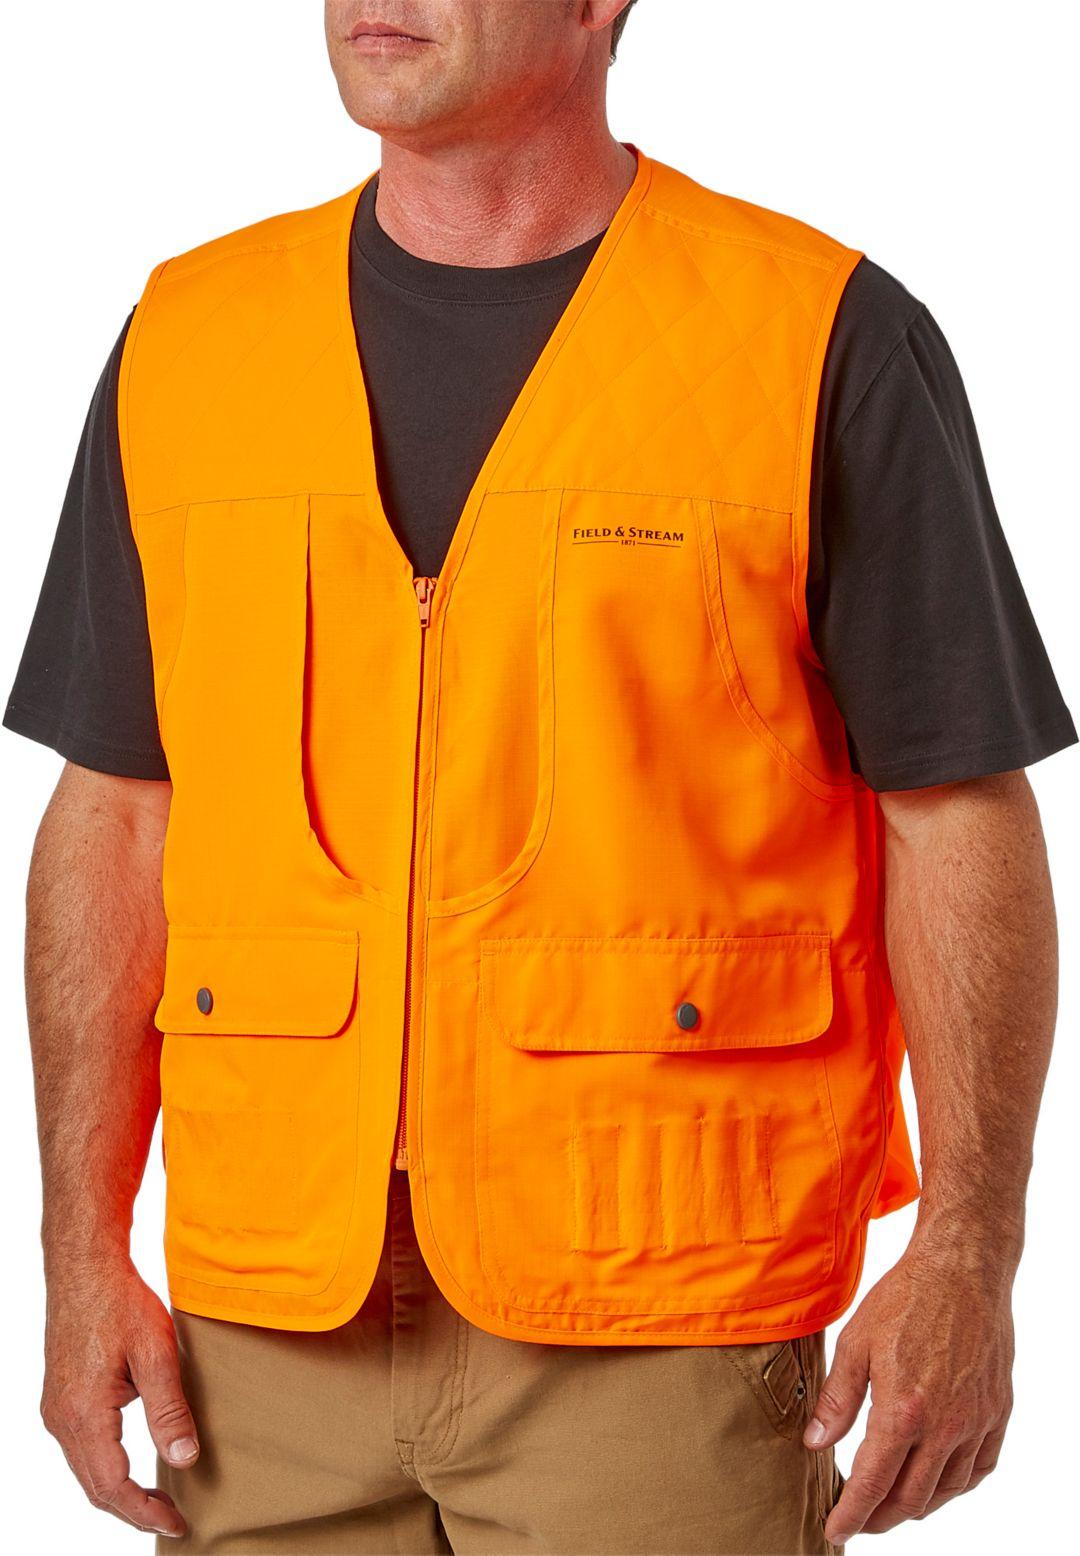 27f43dc0aac84 Field & Stream Men's Blaze Orange Front Loader Hunting Vest | DICK'S  Sporting Goods